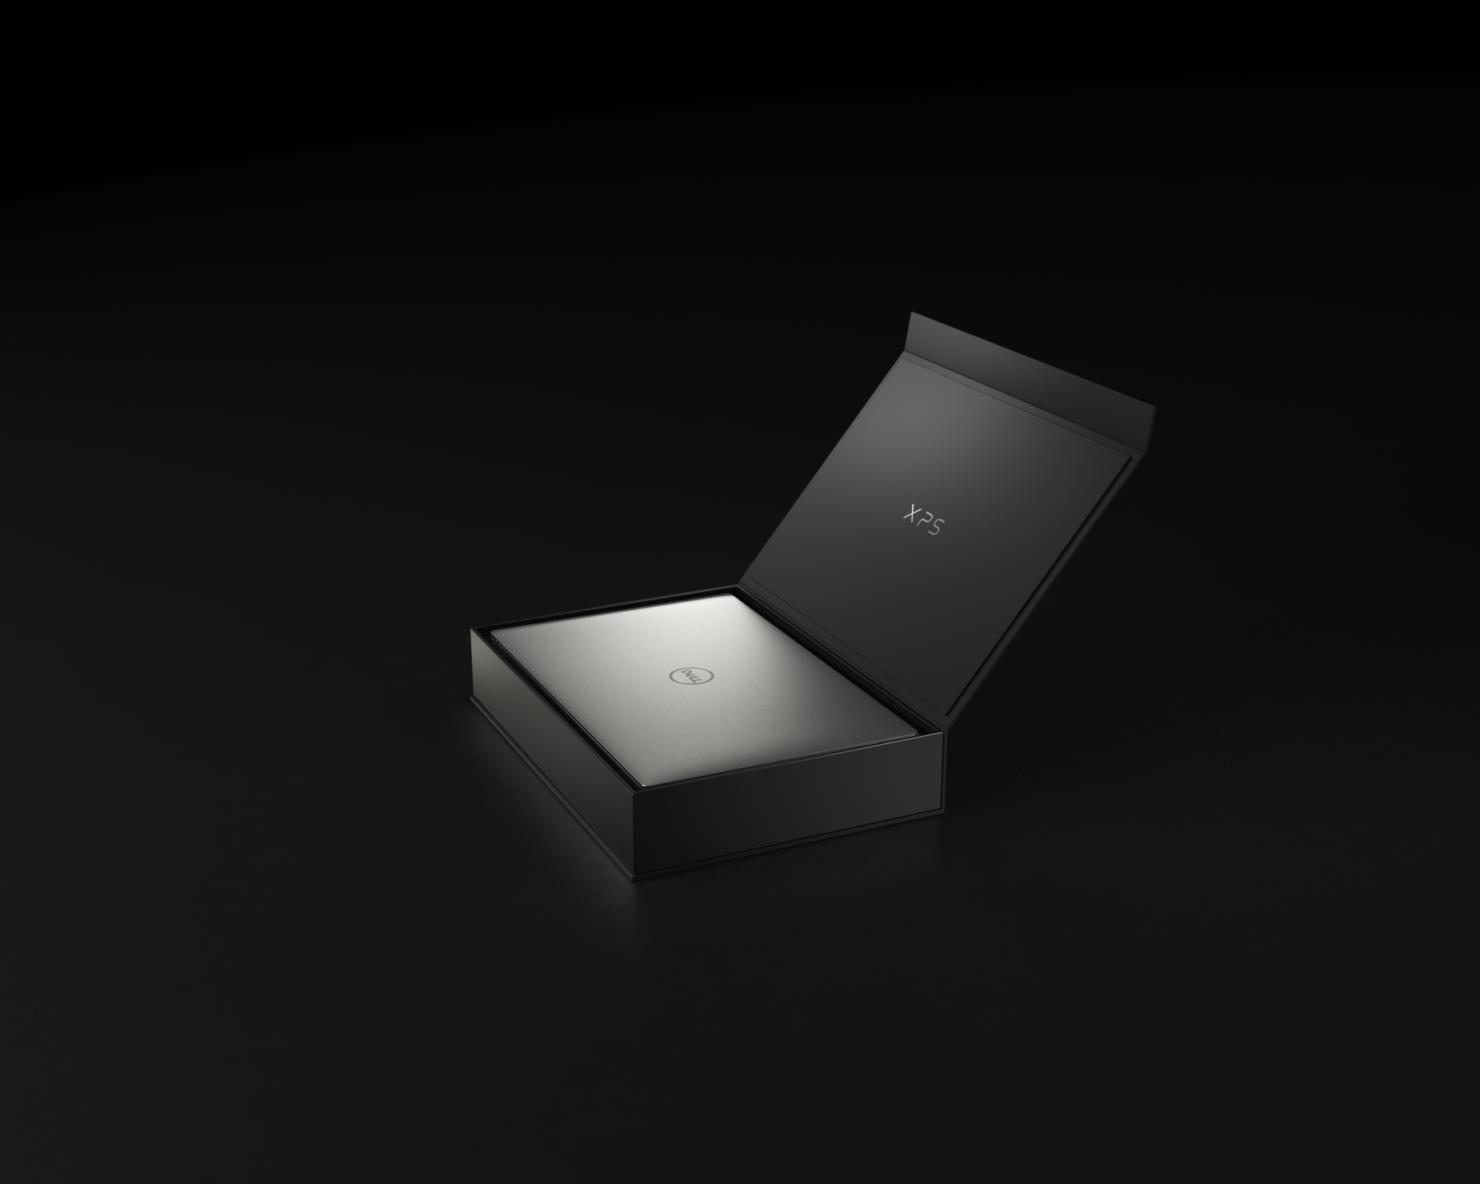 xps_13-boxed-background-2-custom